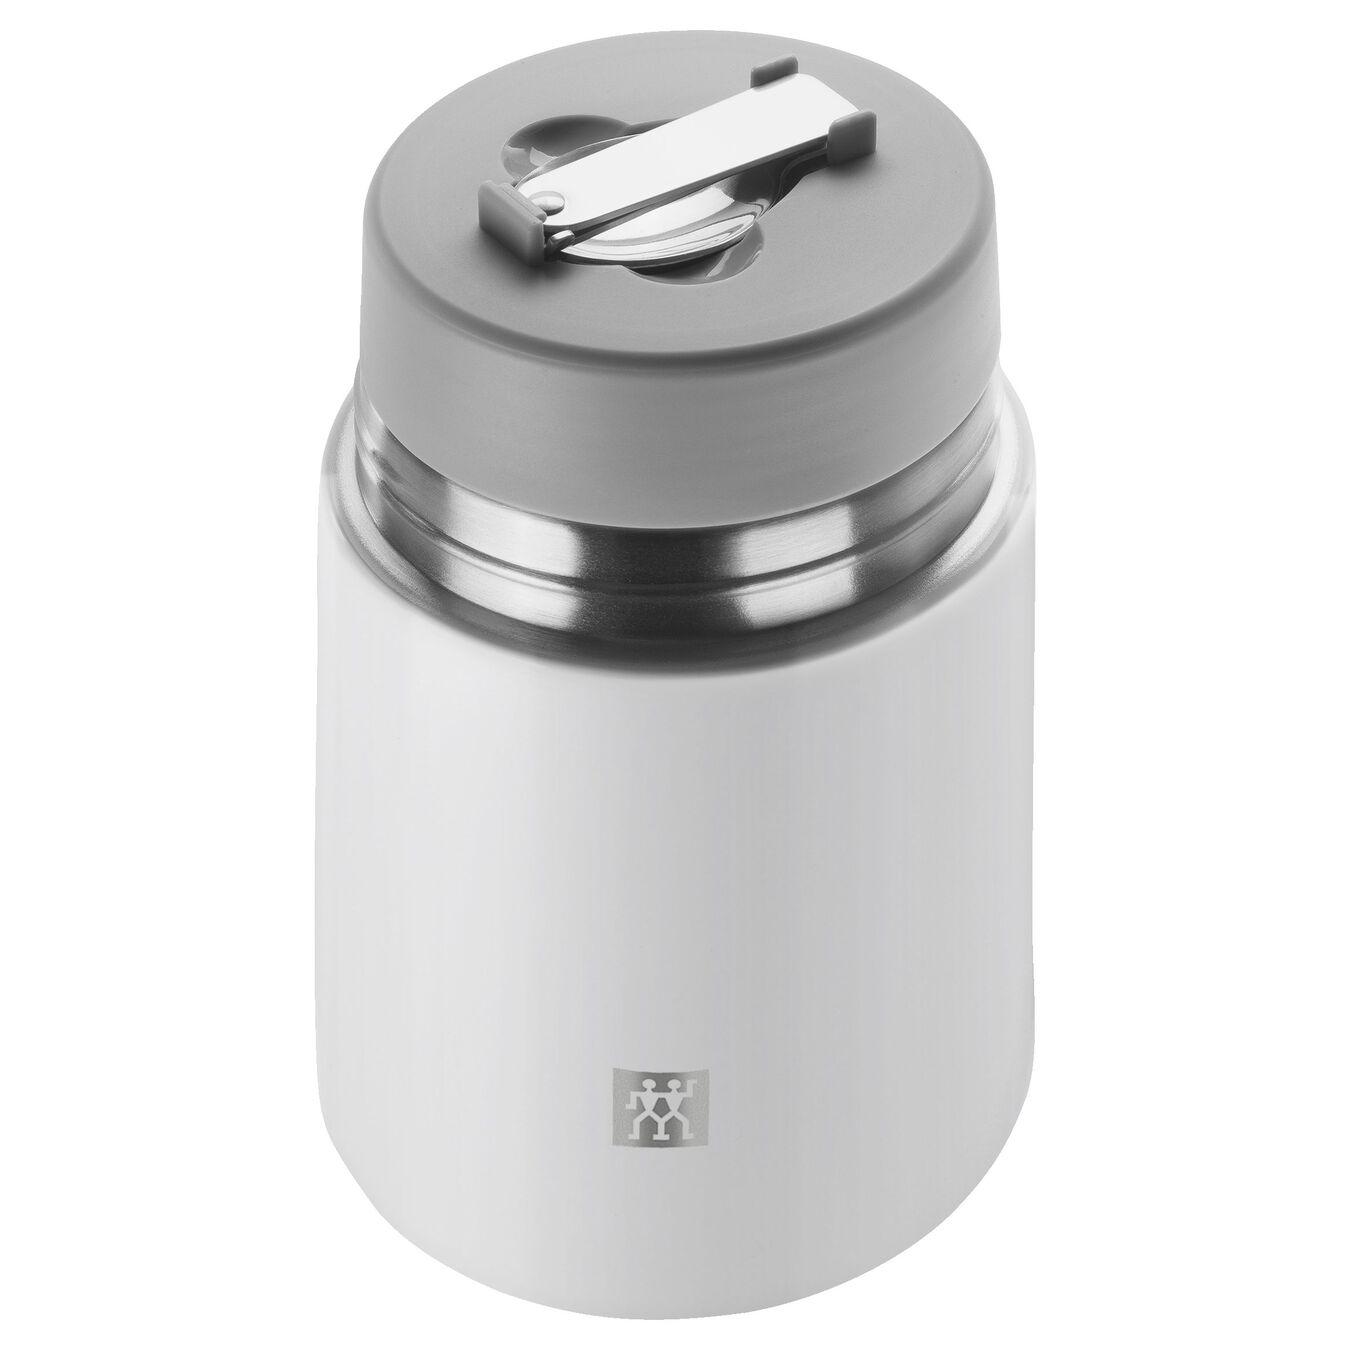 Recipiente alimentare - 700 ml, acciaio inox, bianco,,large 3